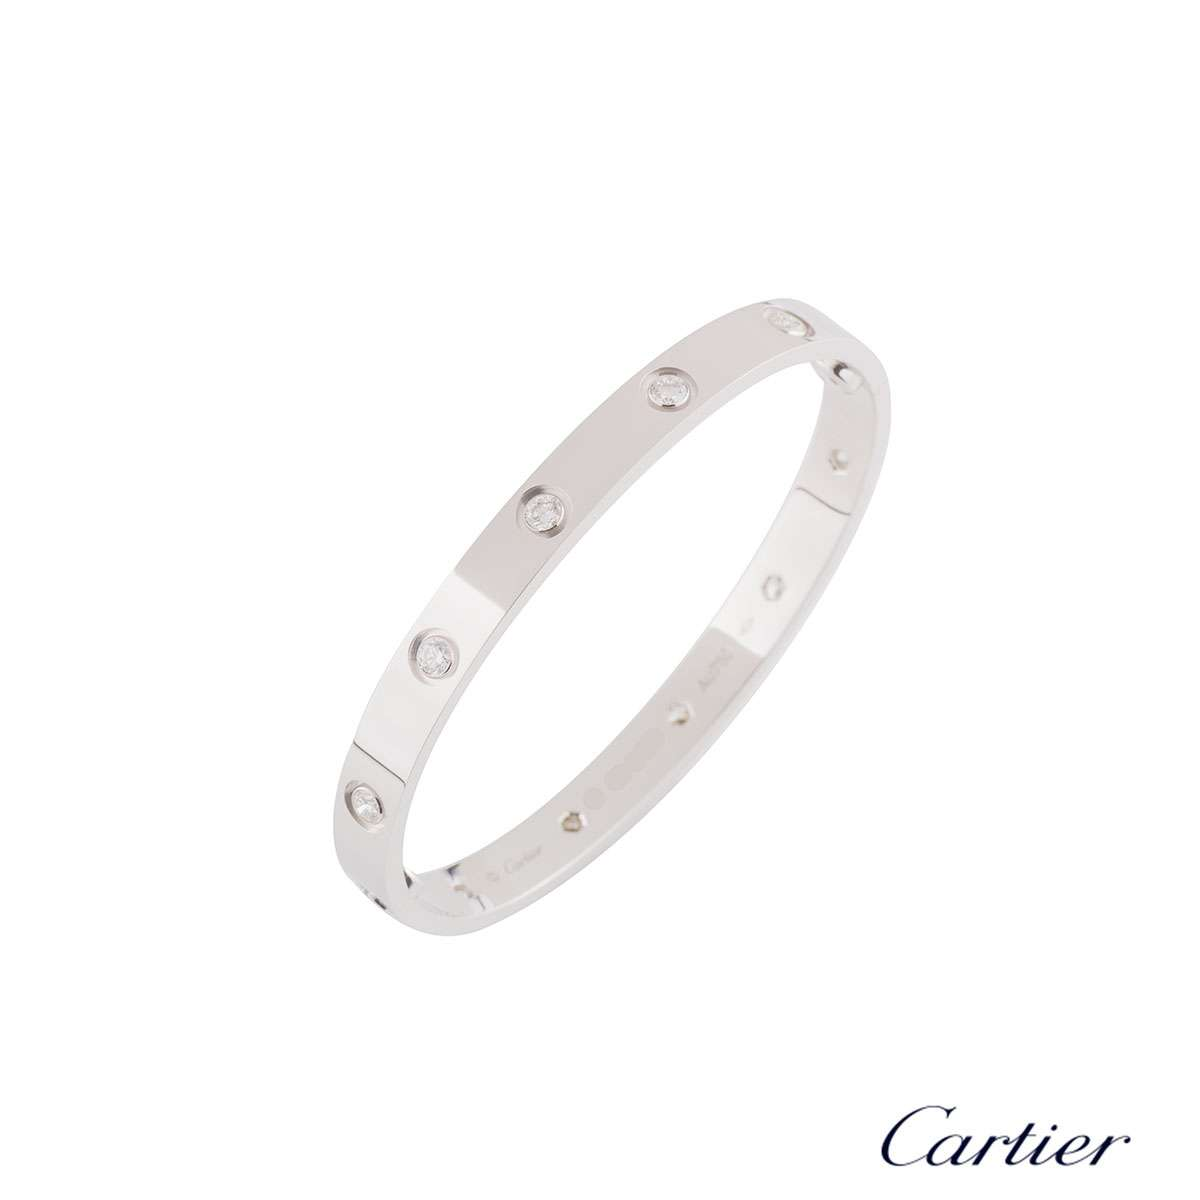 CartierWhite Gold Full Diamond Love BraceletSize 19B6040719